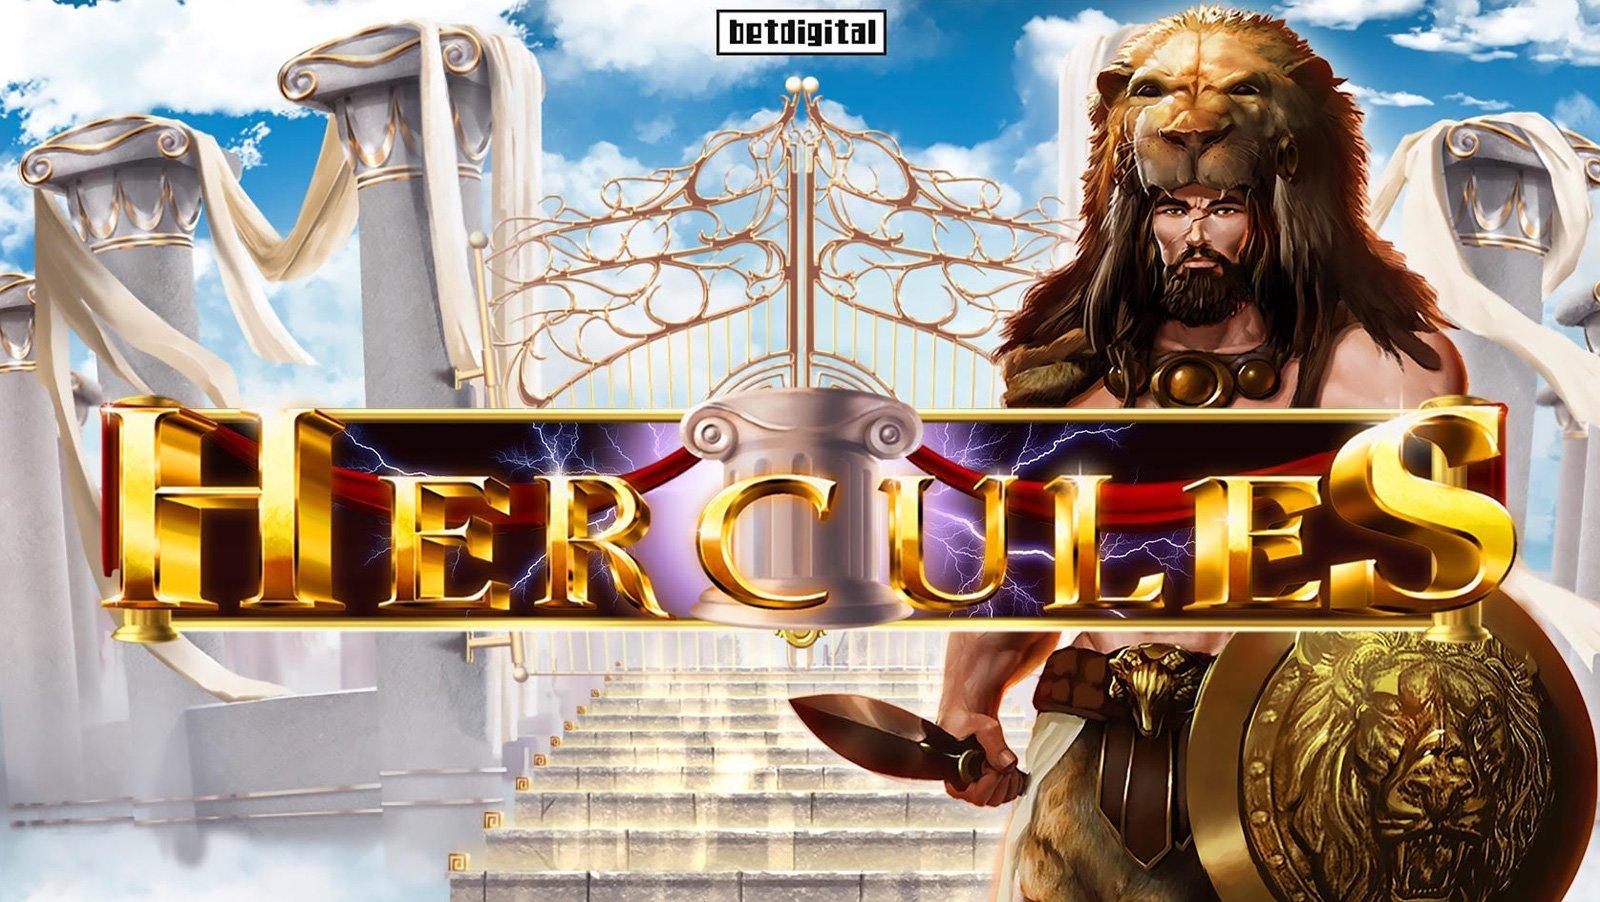 Betdigital's Hercules slot powers up William Hill's performance charts